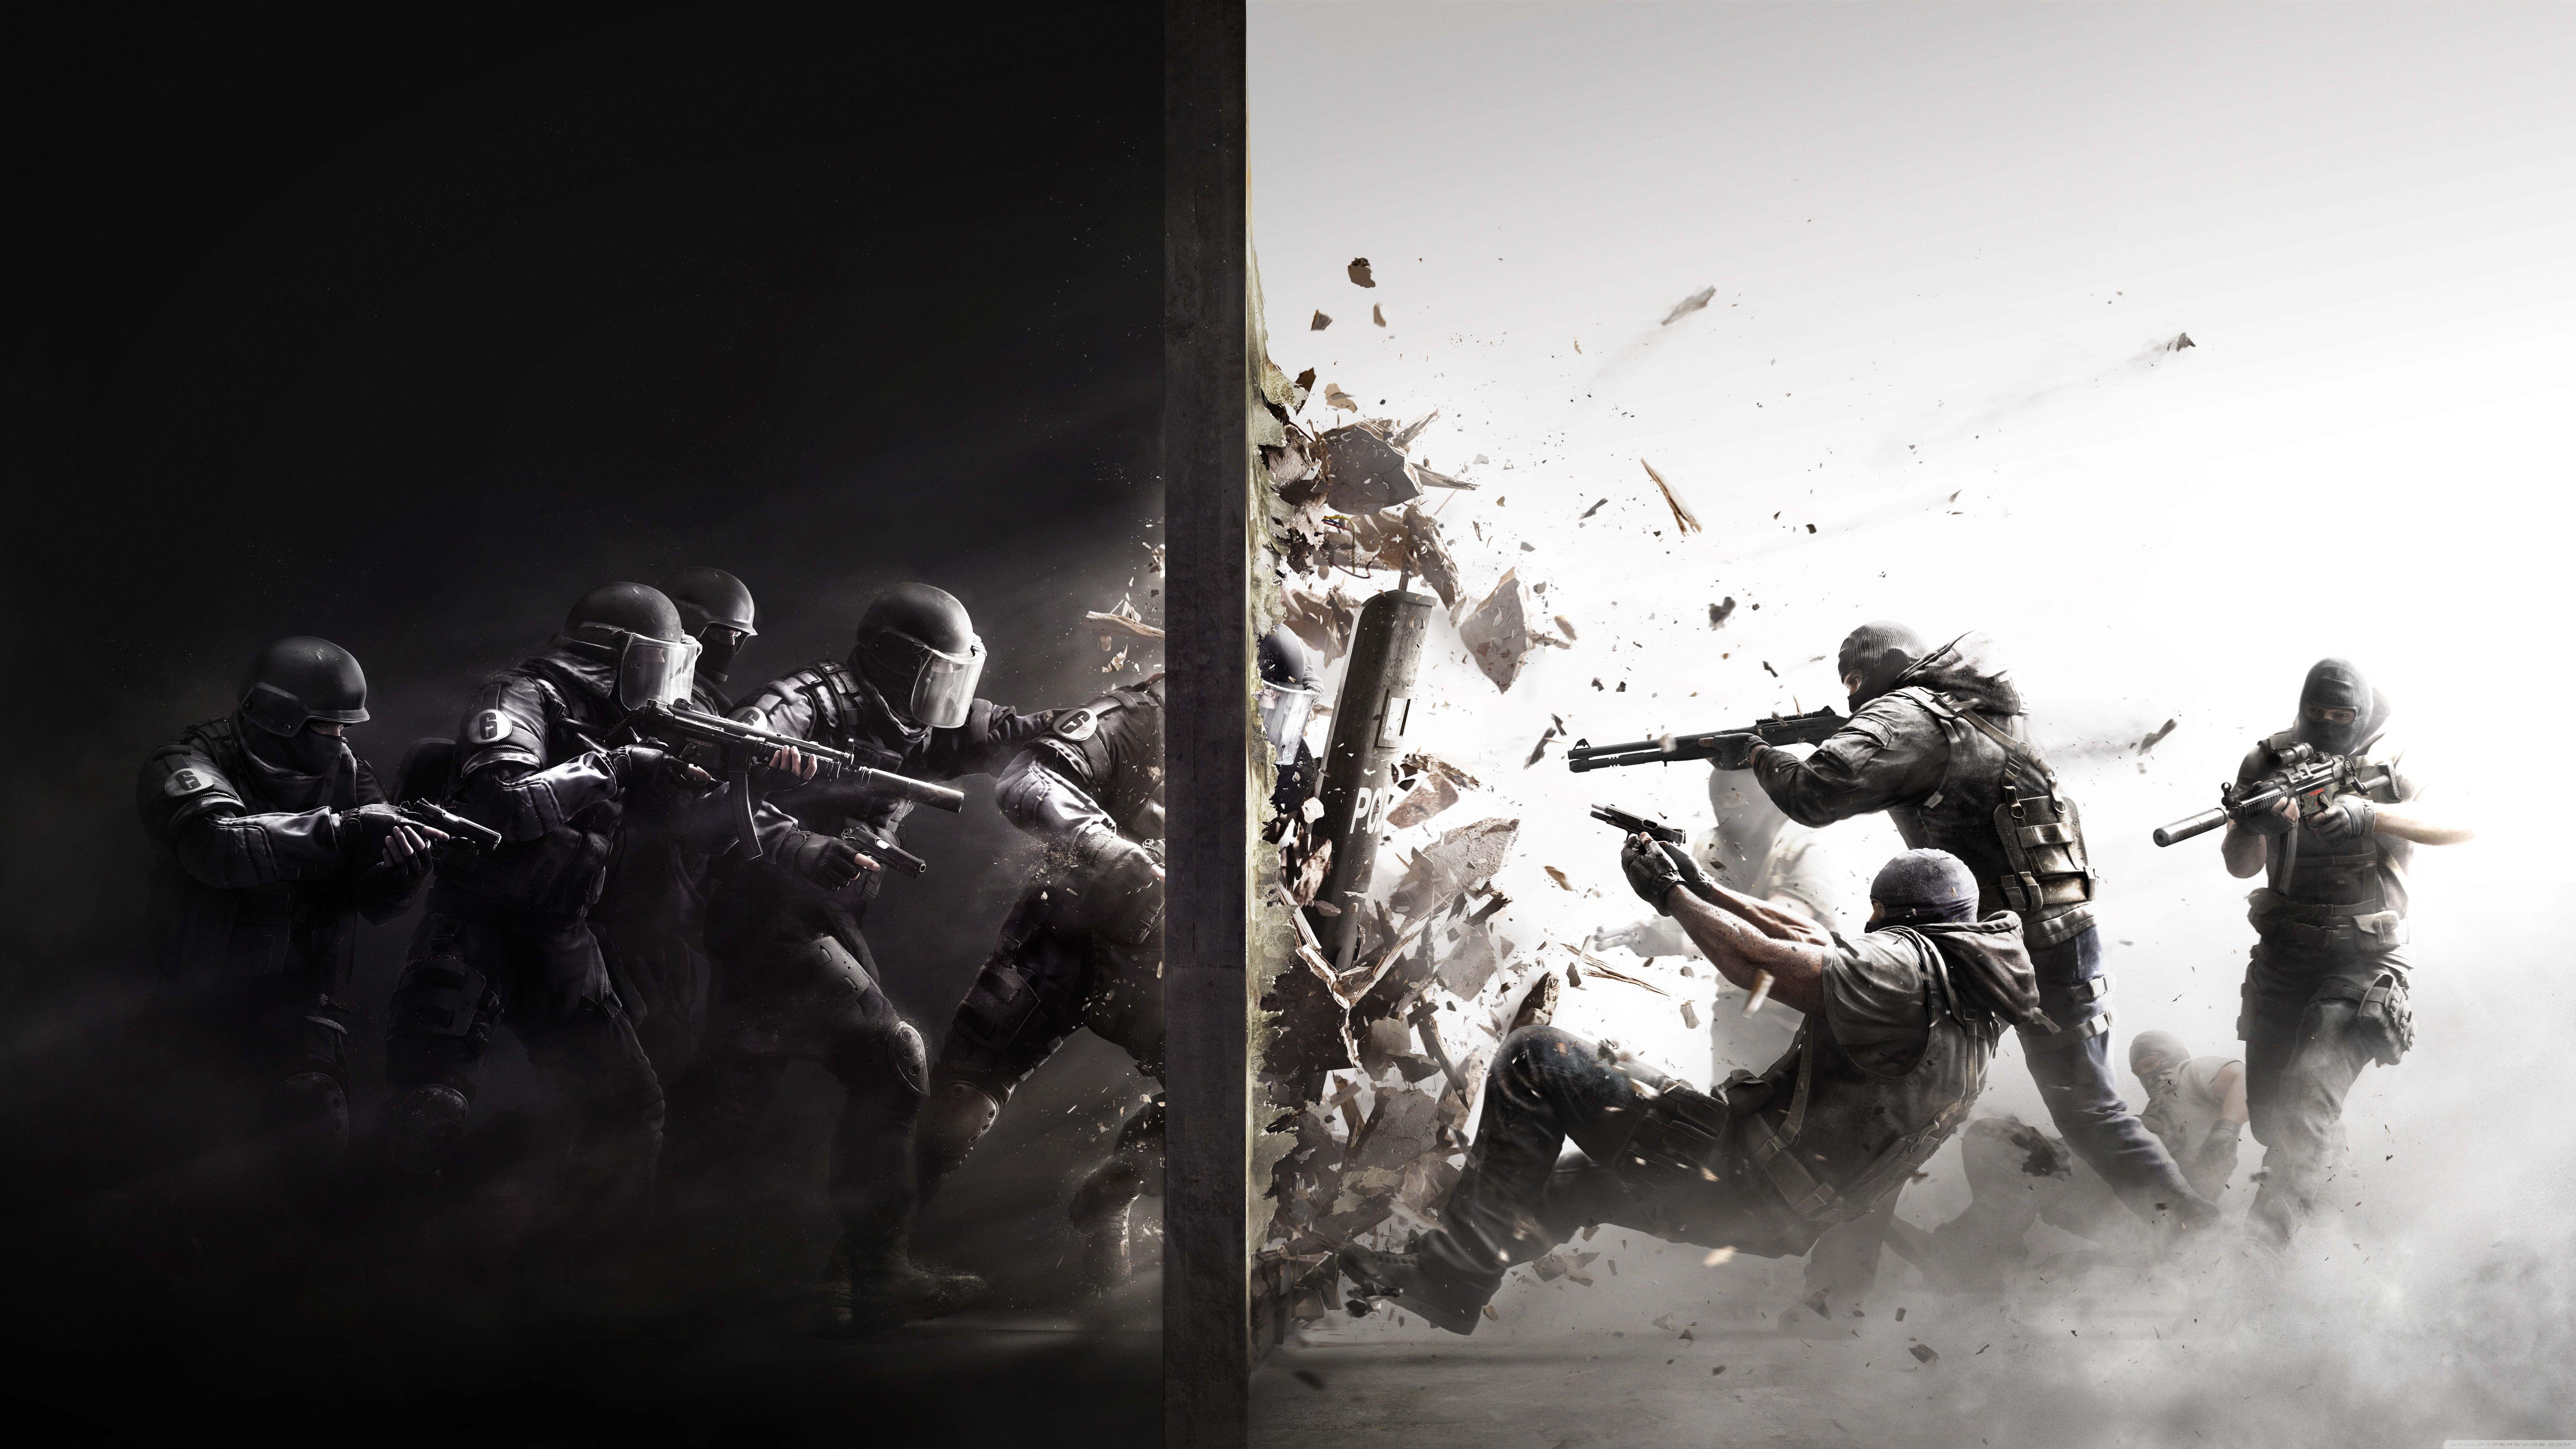 8k Ultra Hd Gaming Wallpapers Top Free 8k Ultra Hd Gaming Backgrounds Wallpaperaccess